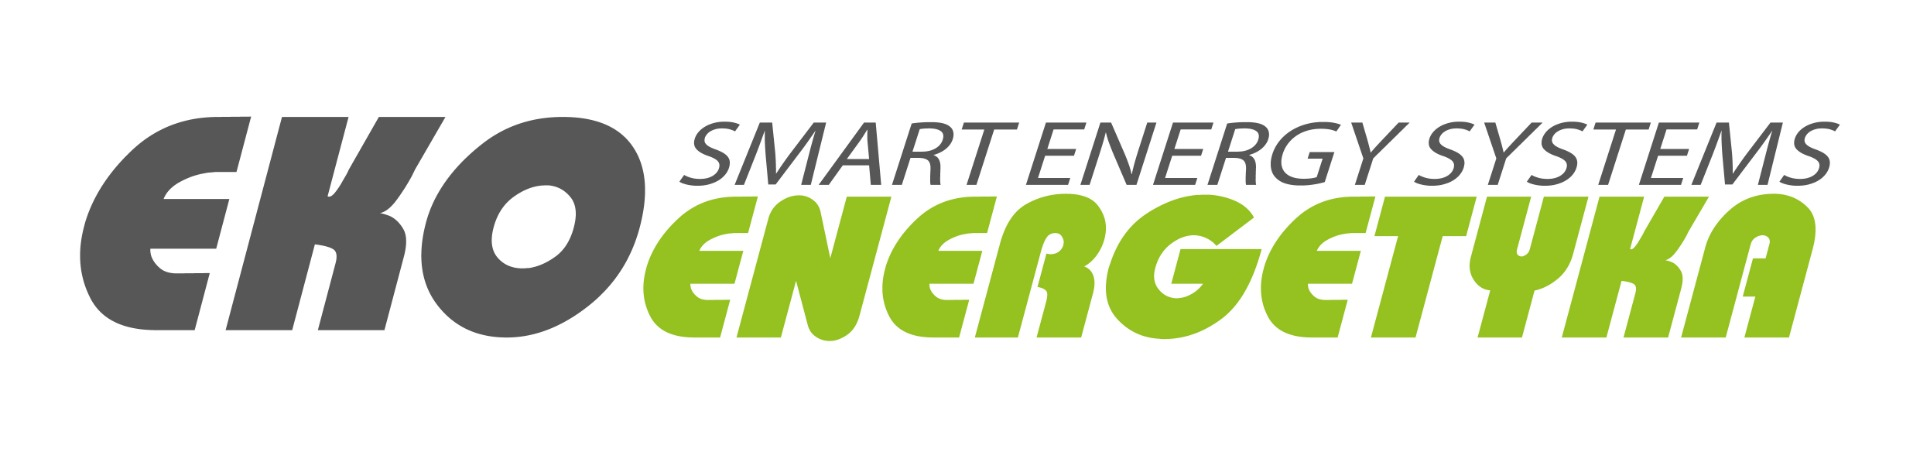 Ekoenergetyka-LOGO.jpg